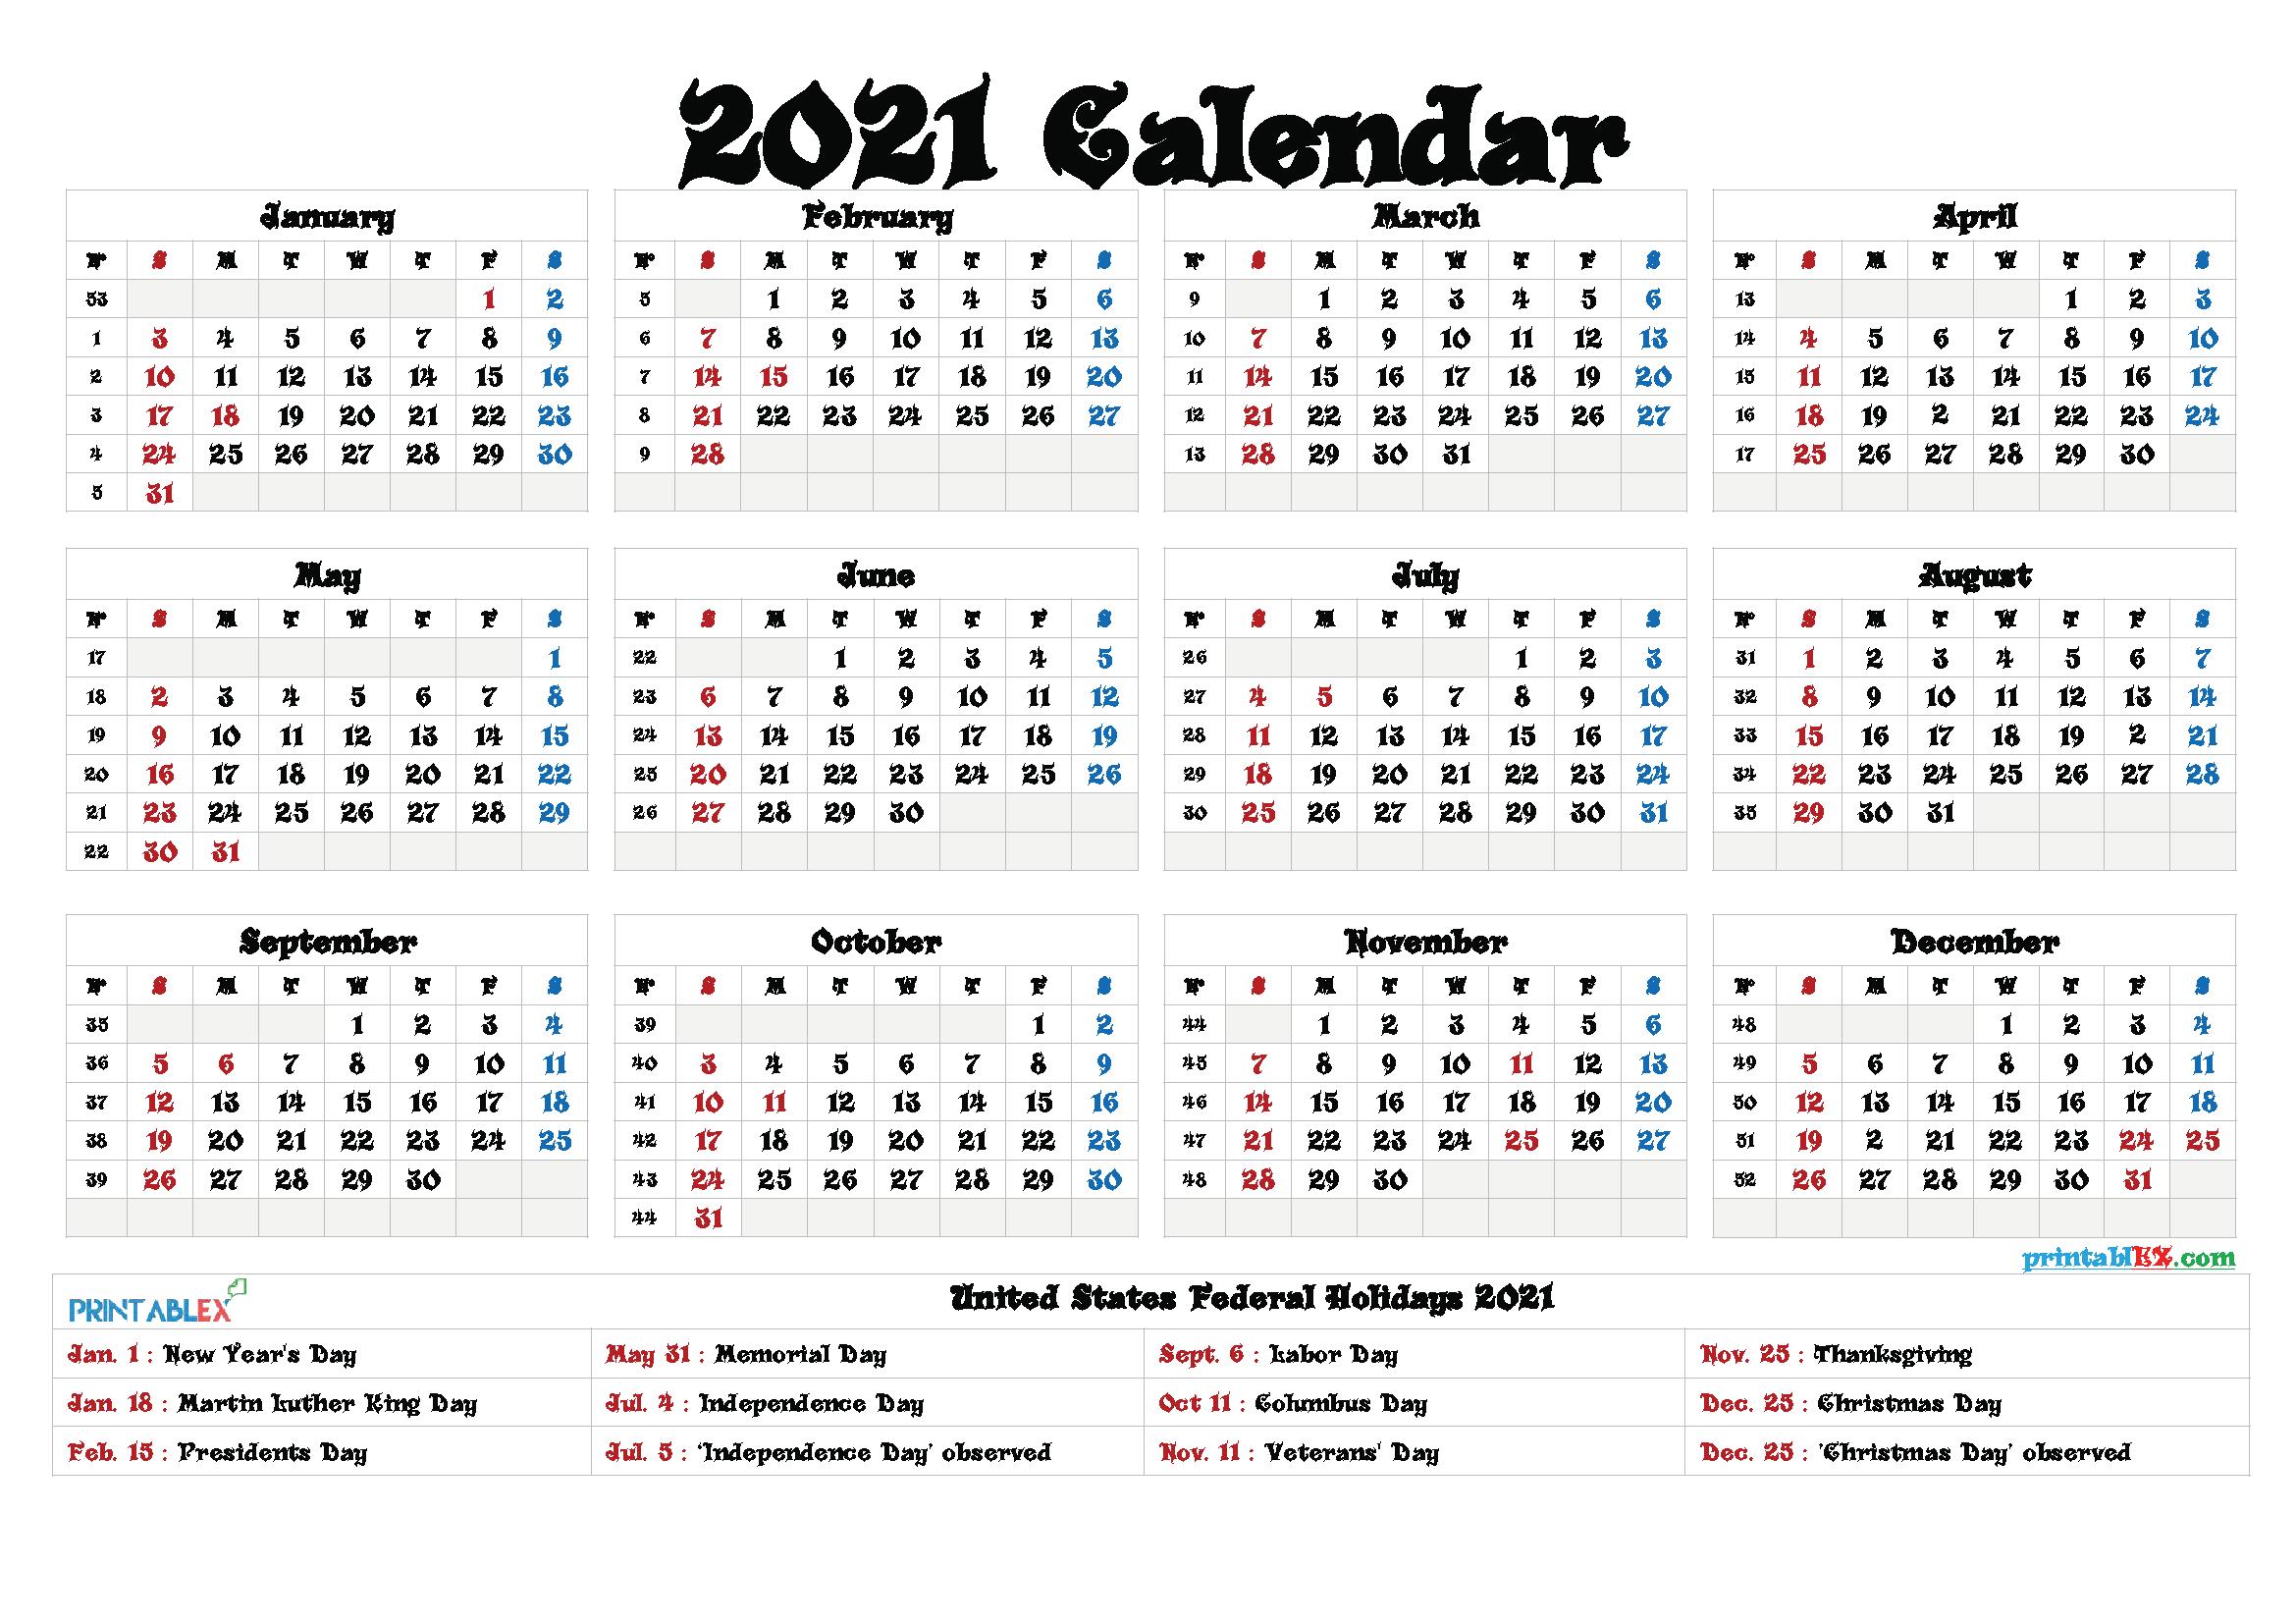 Printable 2021 Calendar With Federal Holidays   Printable Calendars 2021 with 2021 Calendar Free Printable